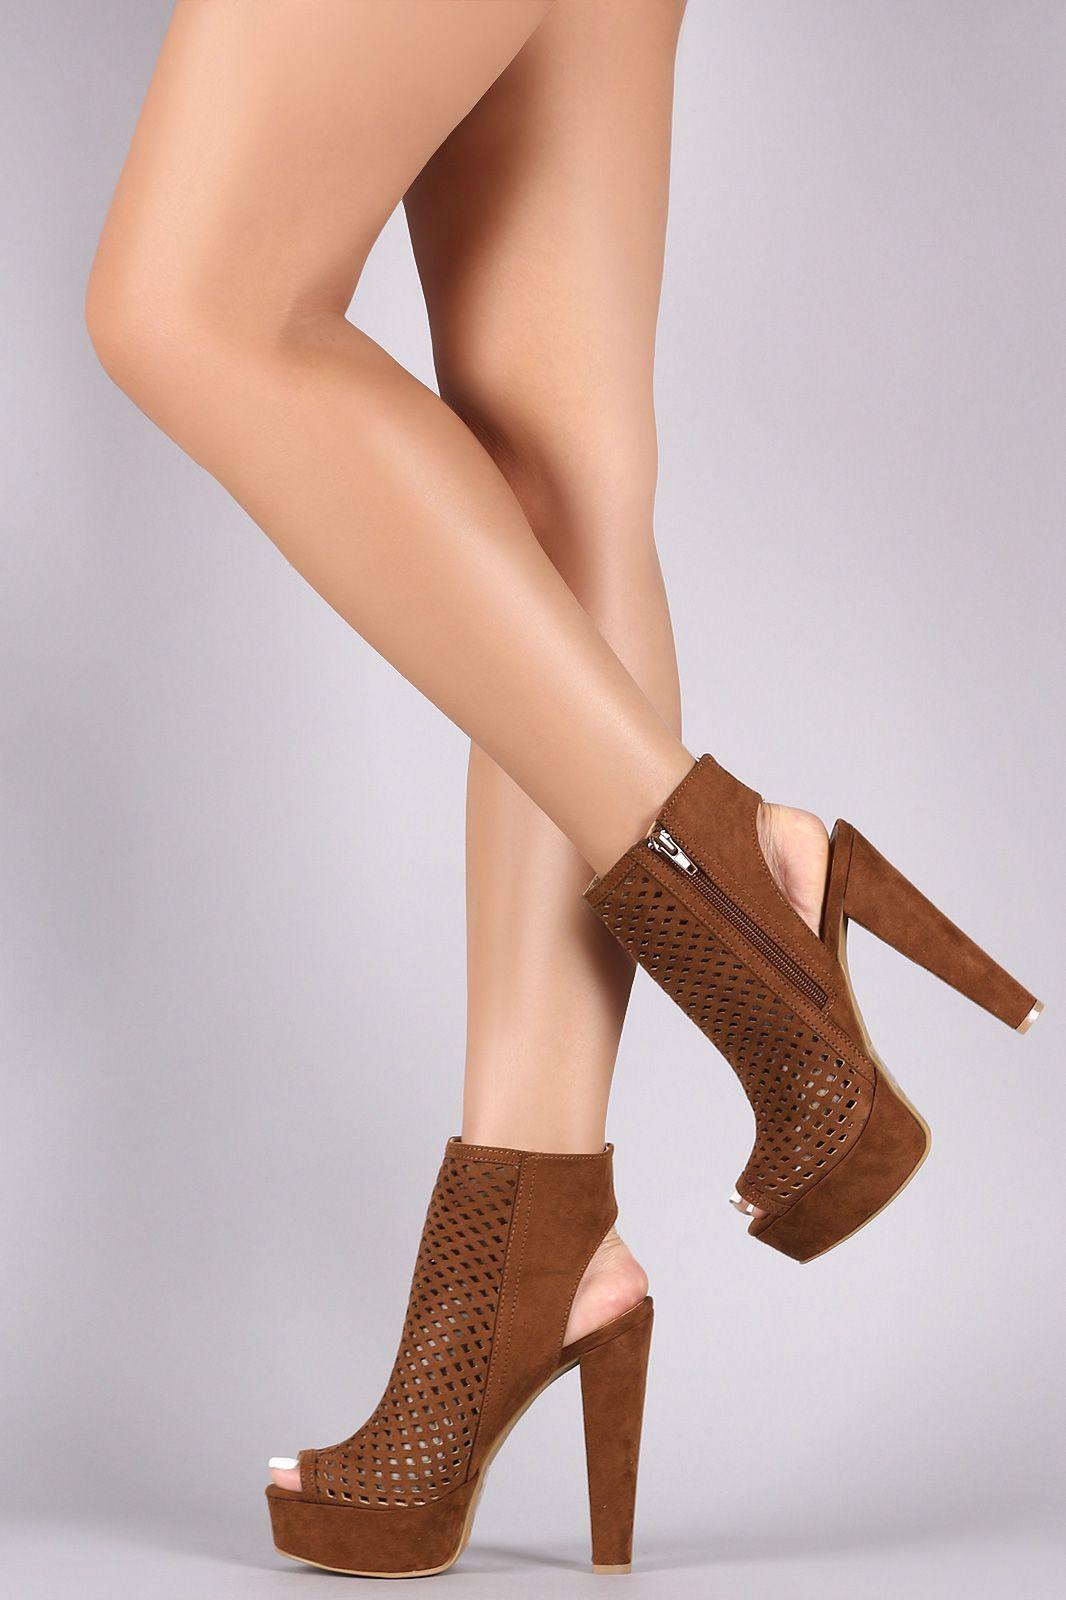 326c1d941 Shop Perforated Suede Peep Toe Chunky Platform Heel Booties featuring a peep  toe